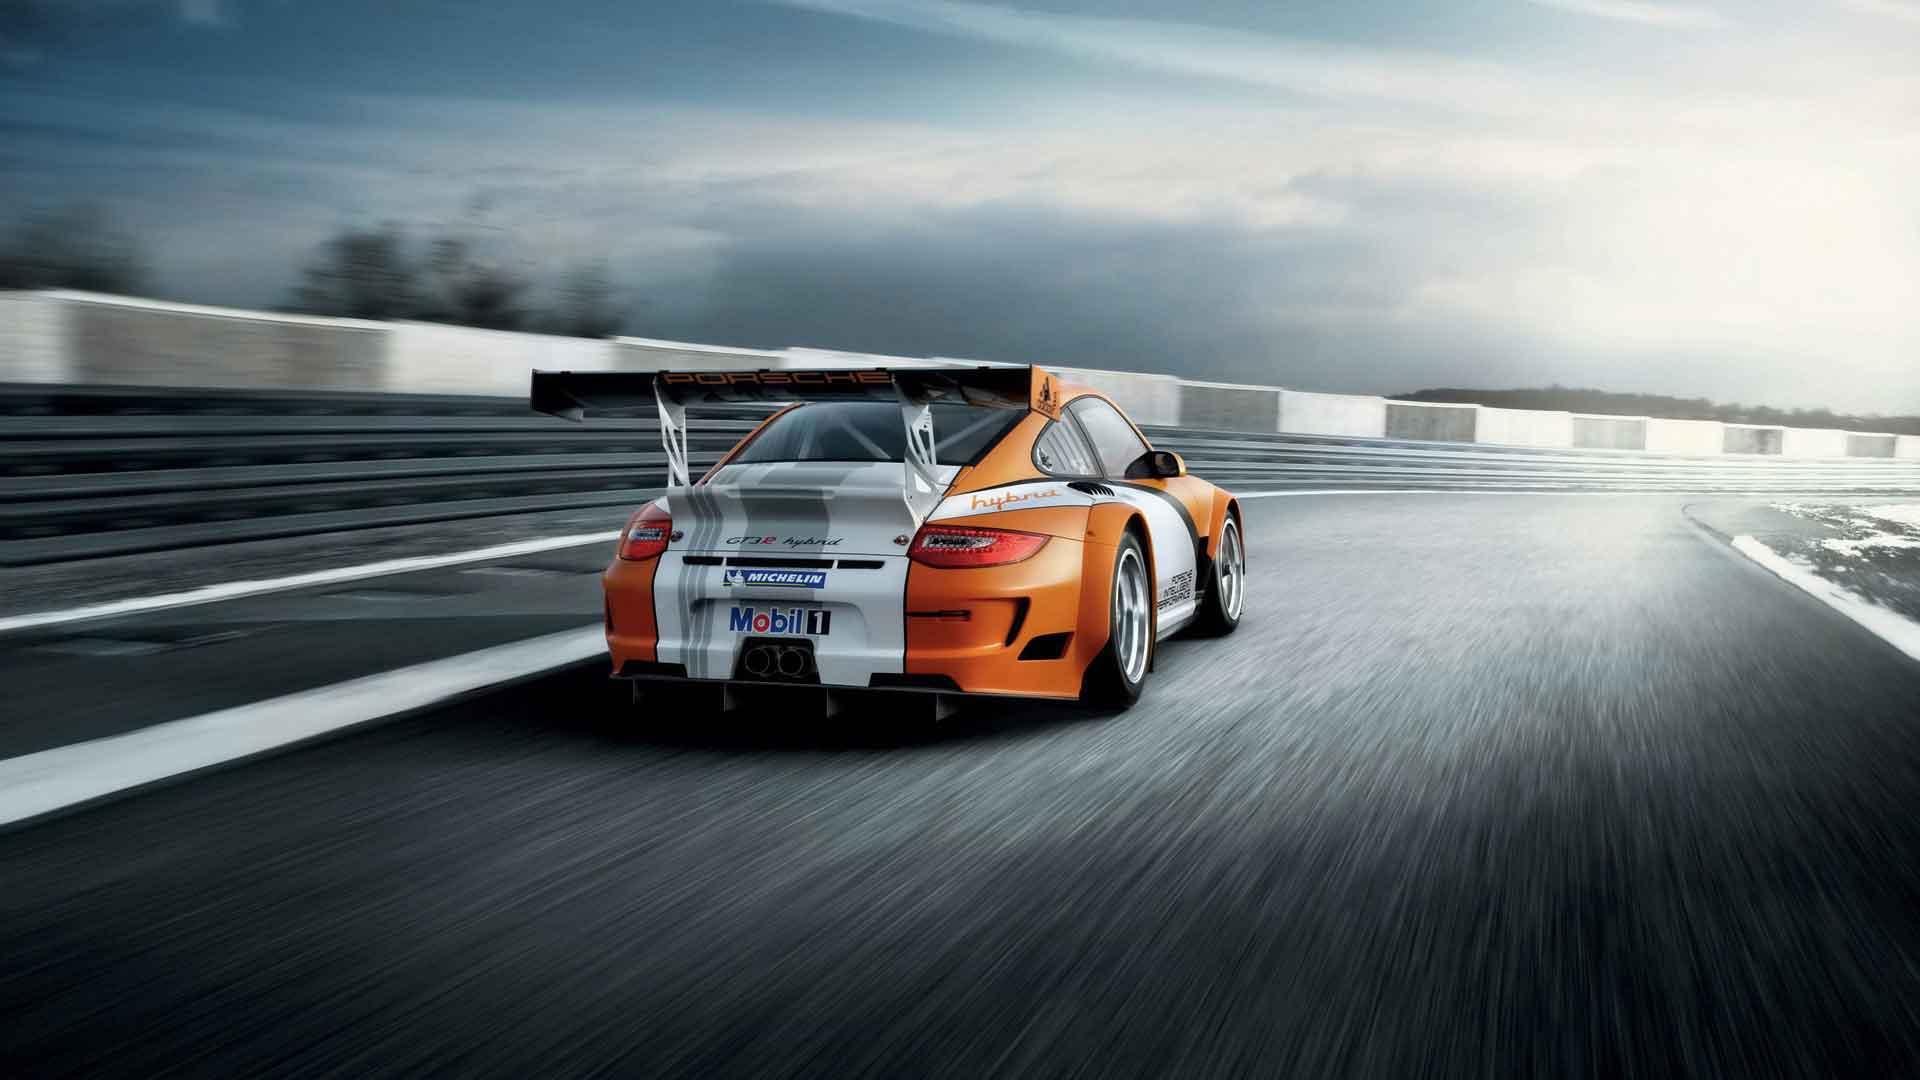 Auto Racing Wallpapers   Top Auto Racing Backgrounds 1920x1080